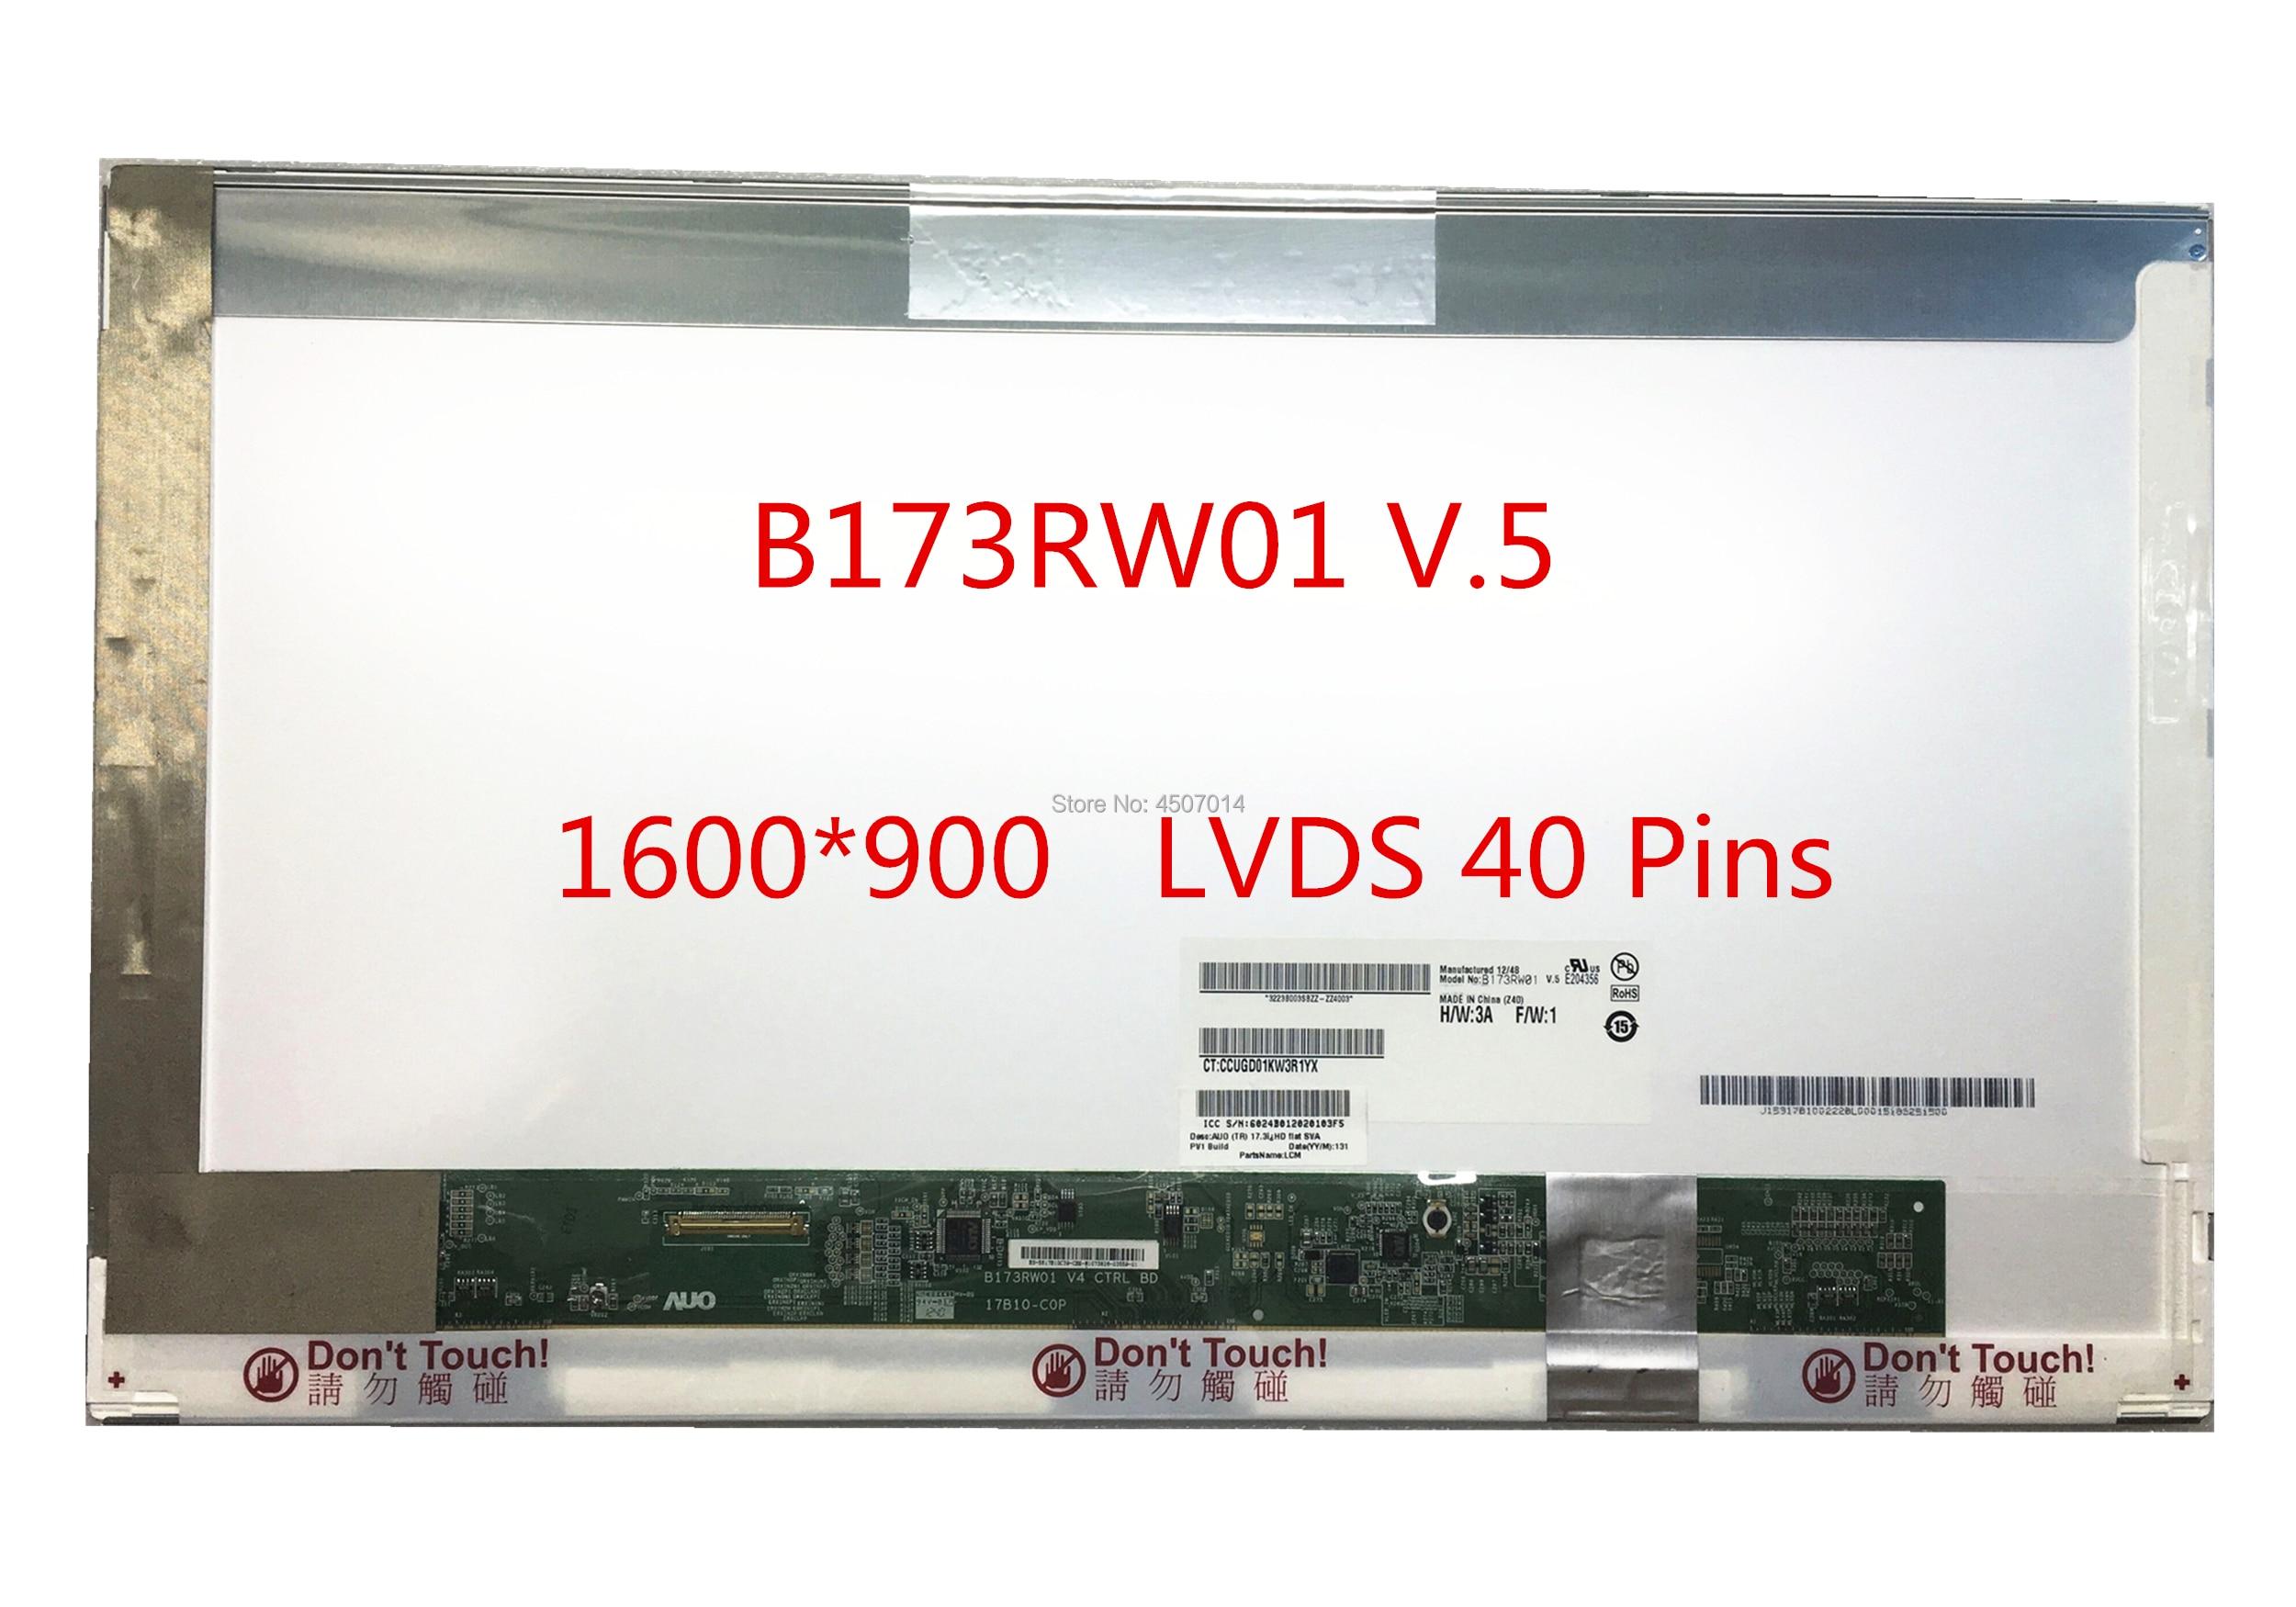 Free shipping B173RW01 V.5 V5 B173RW01 V.1 N173FGE-L13 B173RTN01.2 LP173WD1-TLC1 TLE1 TLF1 Laptop Lcd Screen 1600*900 40 PinsFree shipping B173RW01 V.5 V5 B173RW01 V.1 N173FGE-L13 B173RTN01.2 LP173WD1-TLC1 TLE1 TLF1 Laptop Lcd Screen 1600*900 40 Pins